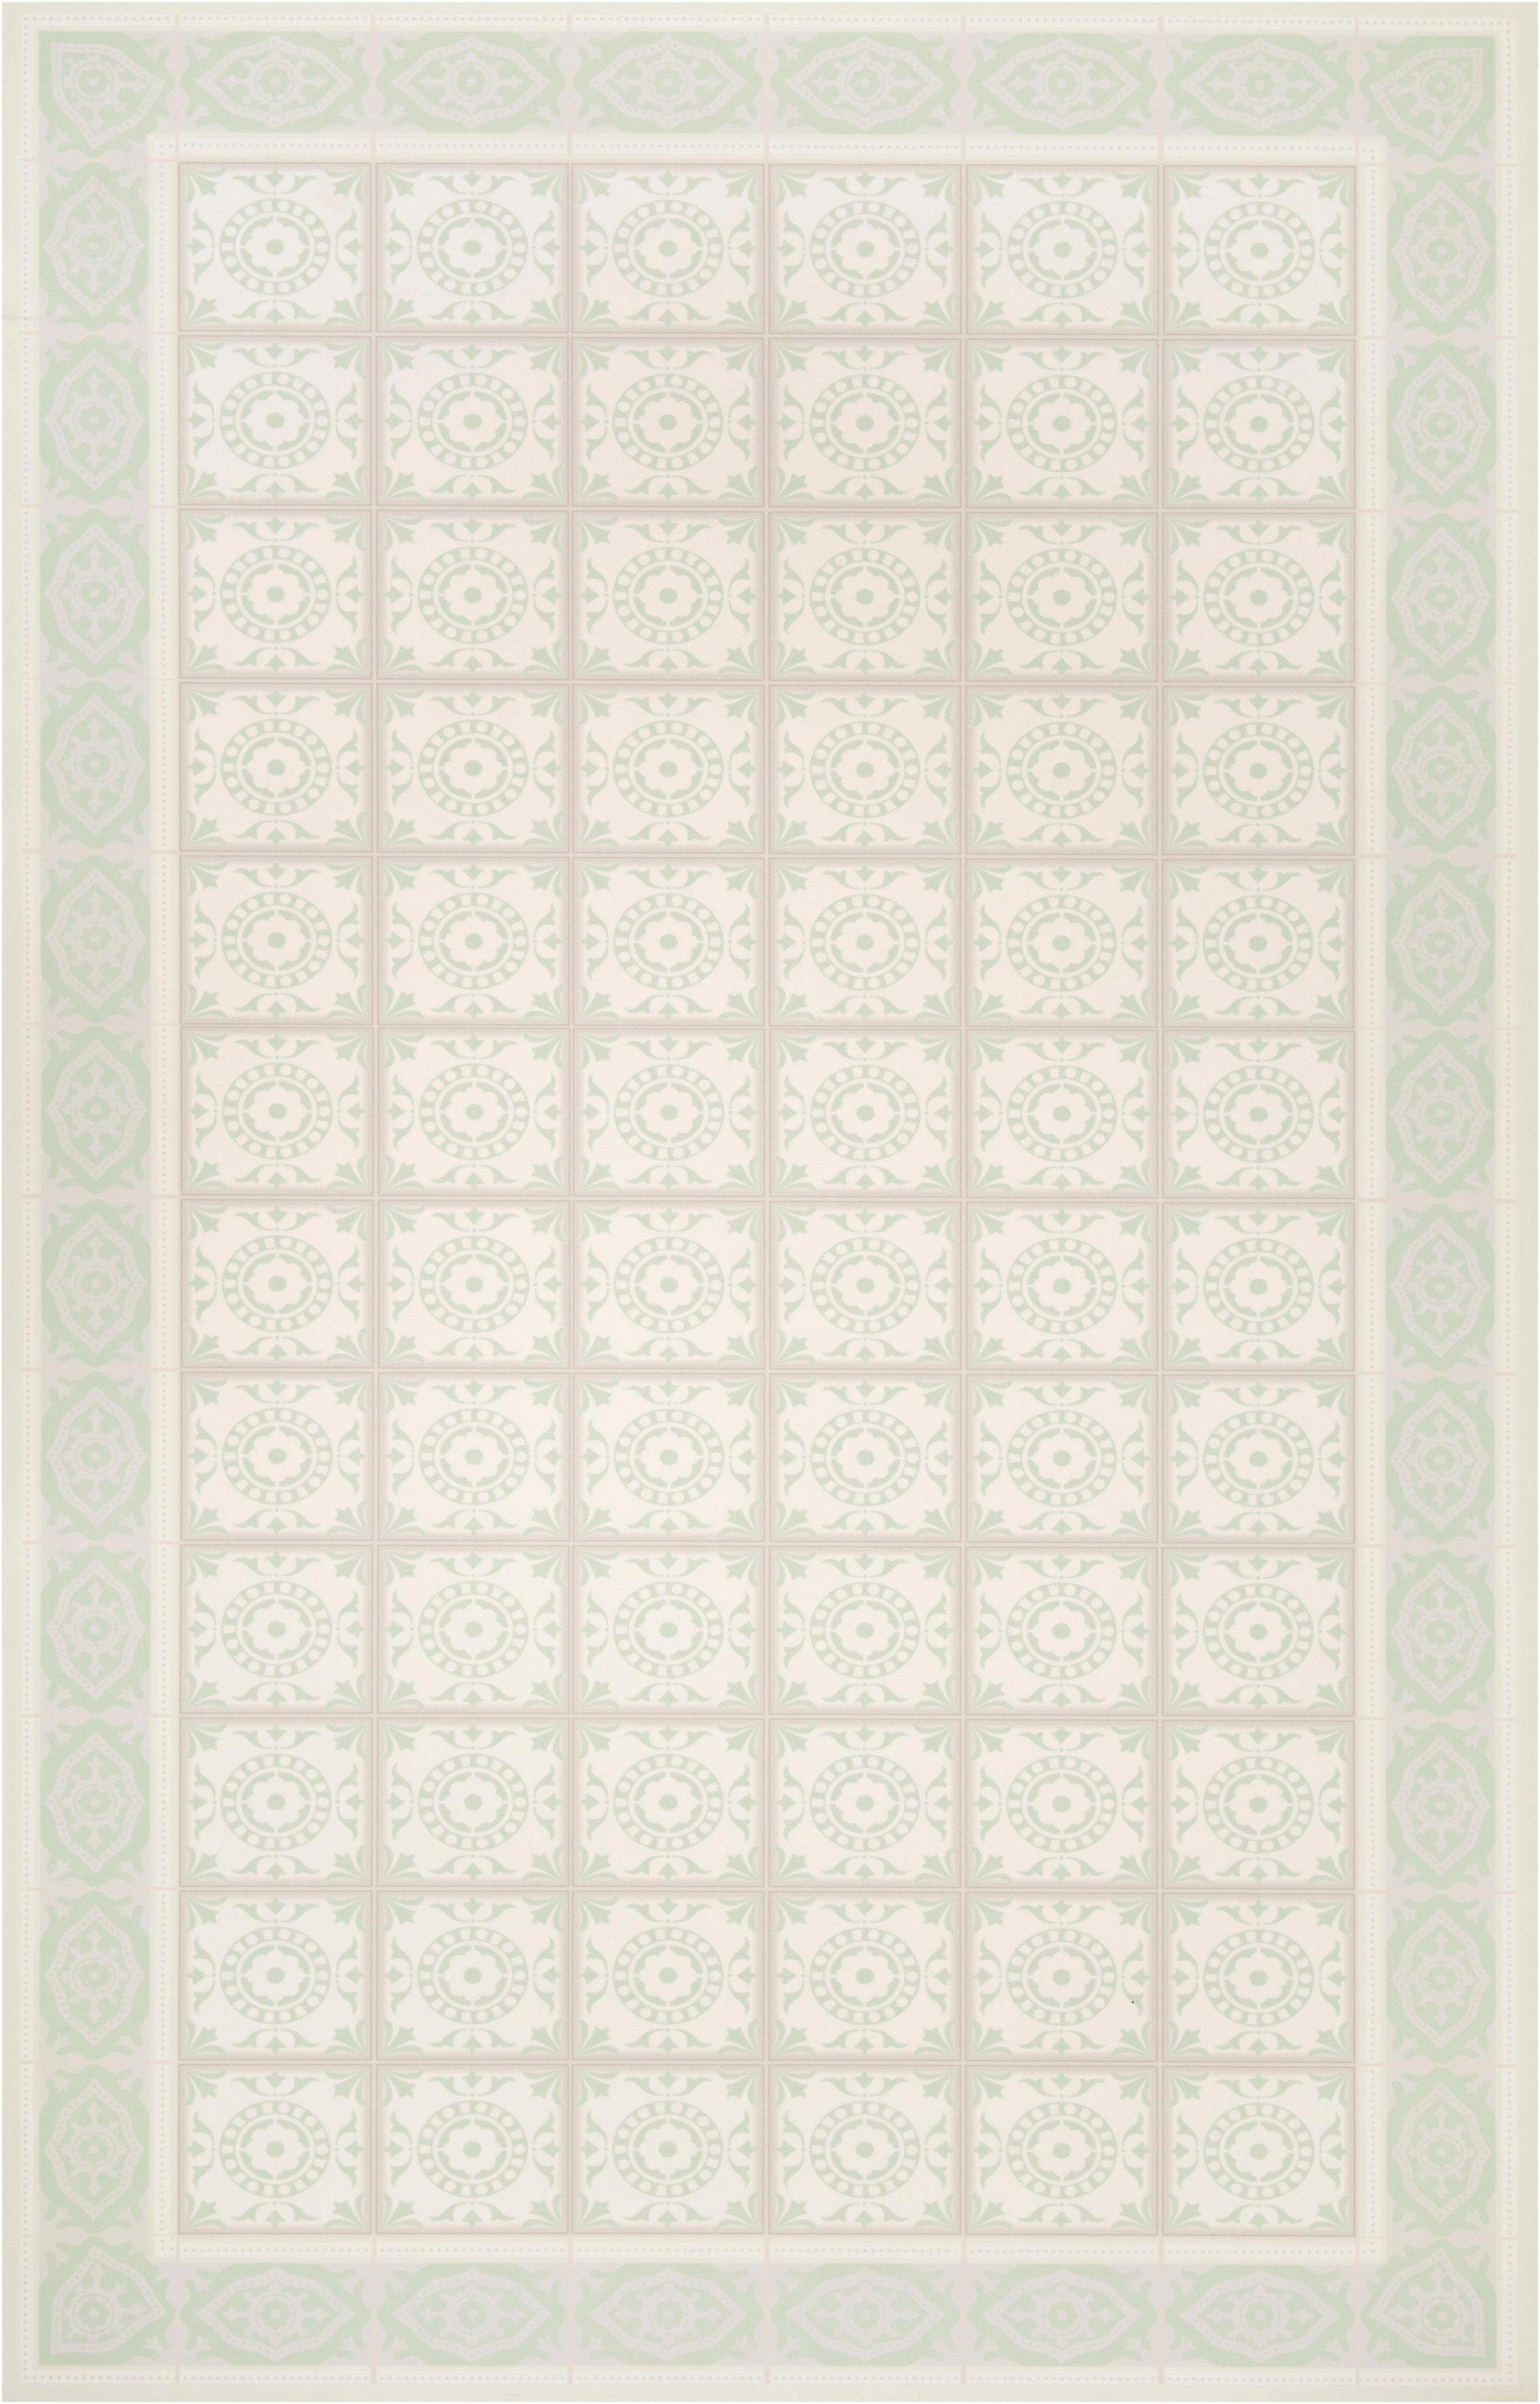 Vinylteppich Aurelie Zala Living rechteckig Höhe 2 mm gedruckt